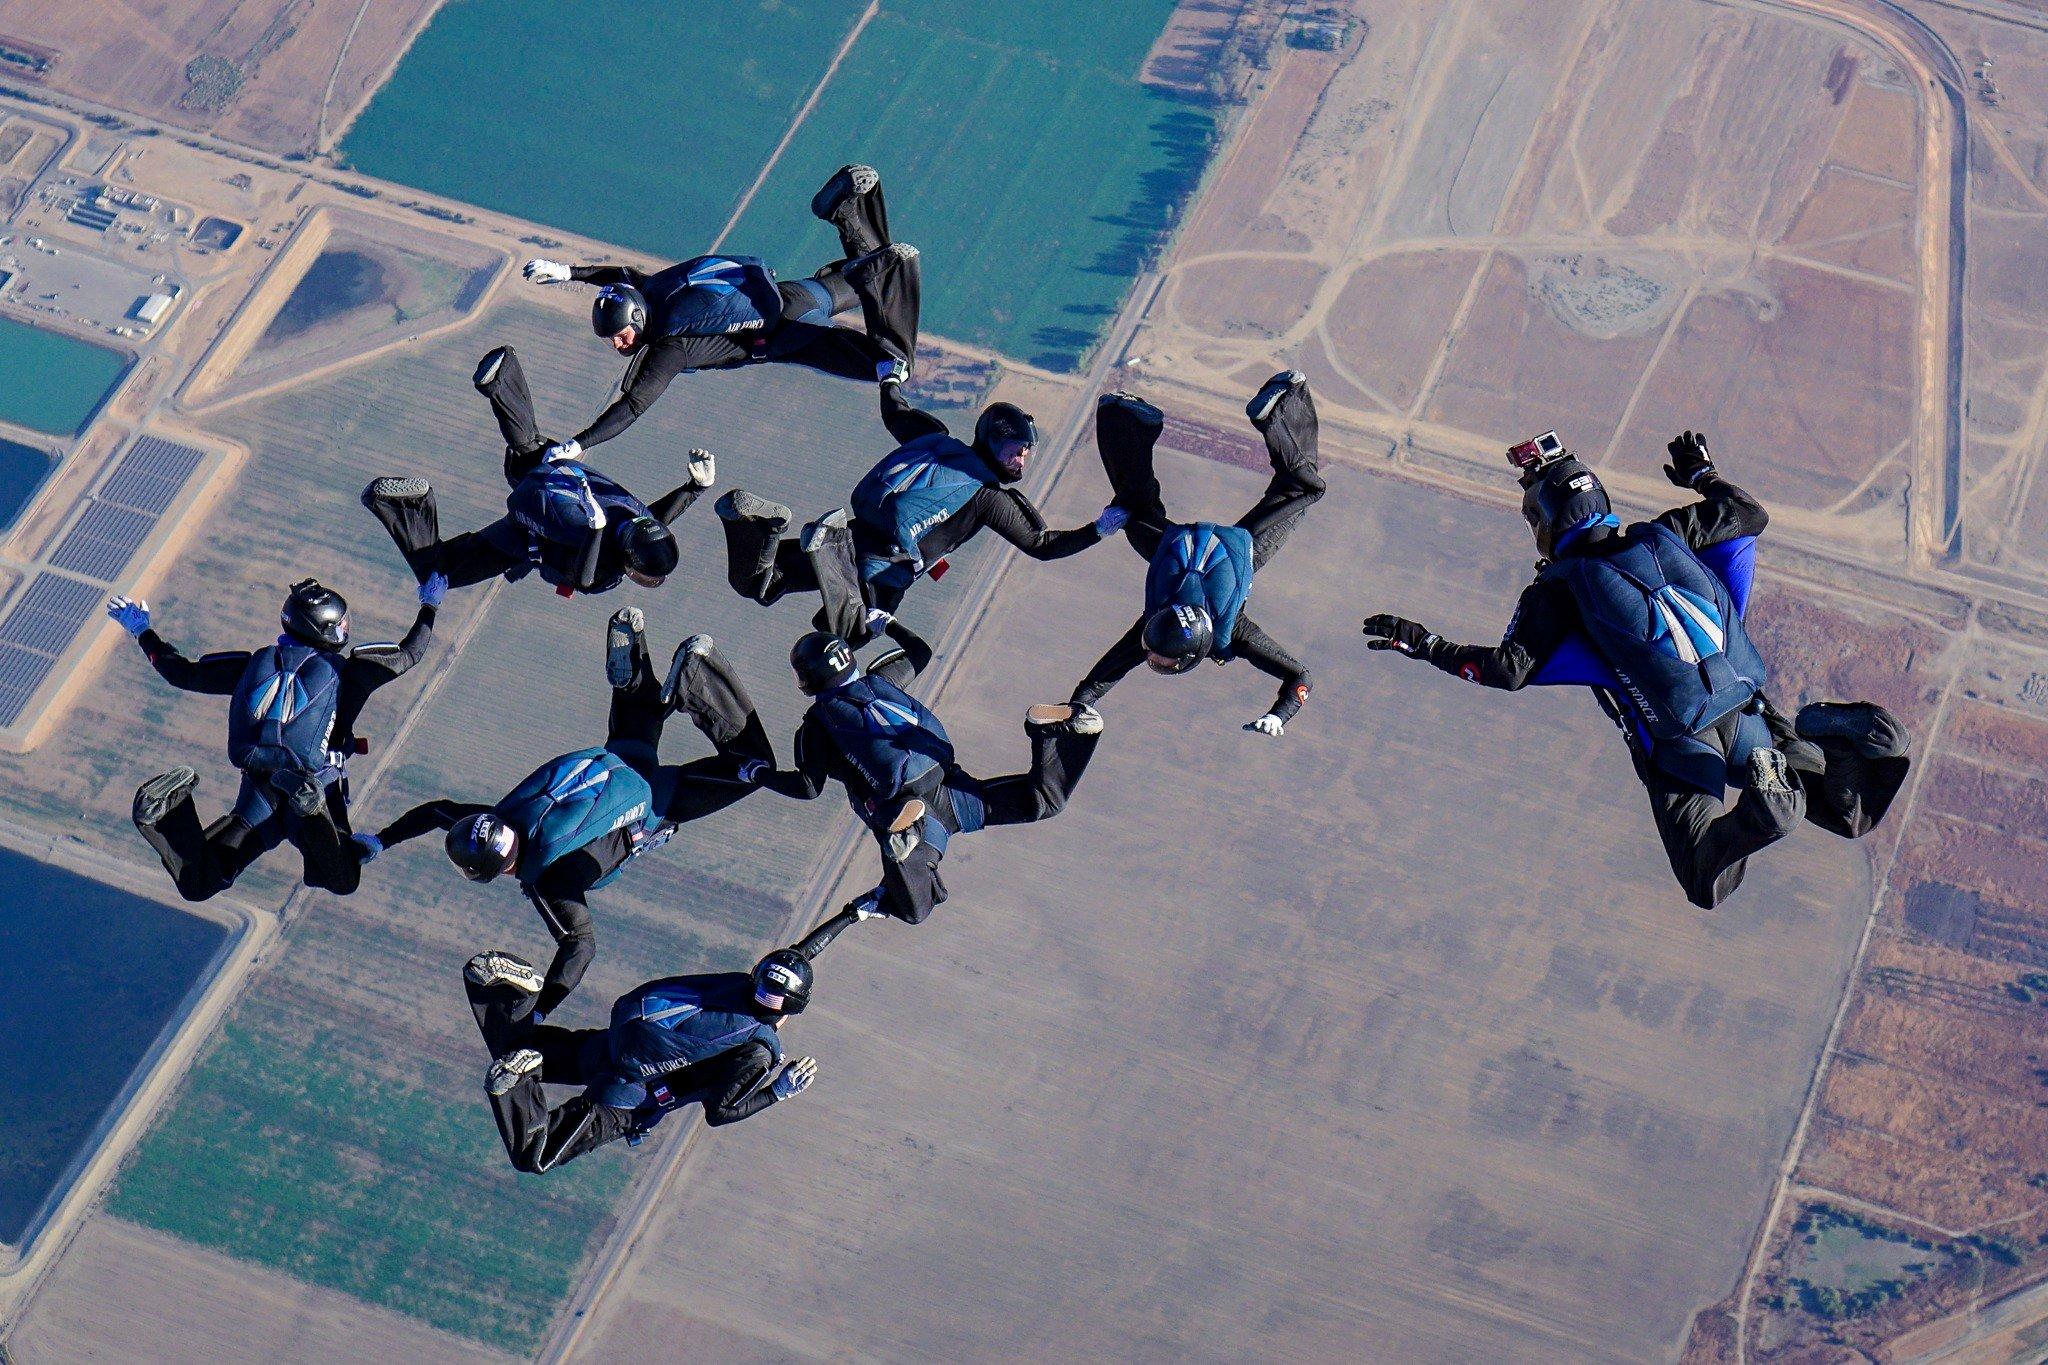 Air Force Rodisiac (Courtesy: David Cherry)